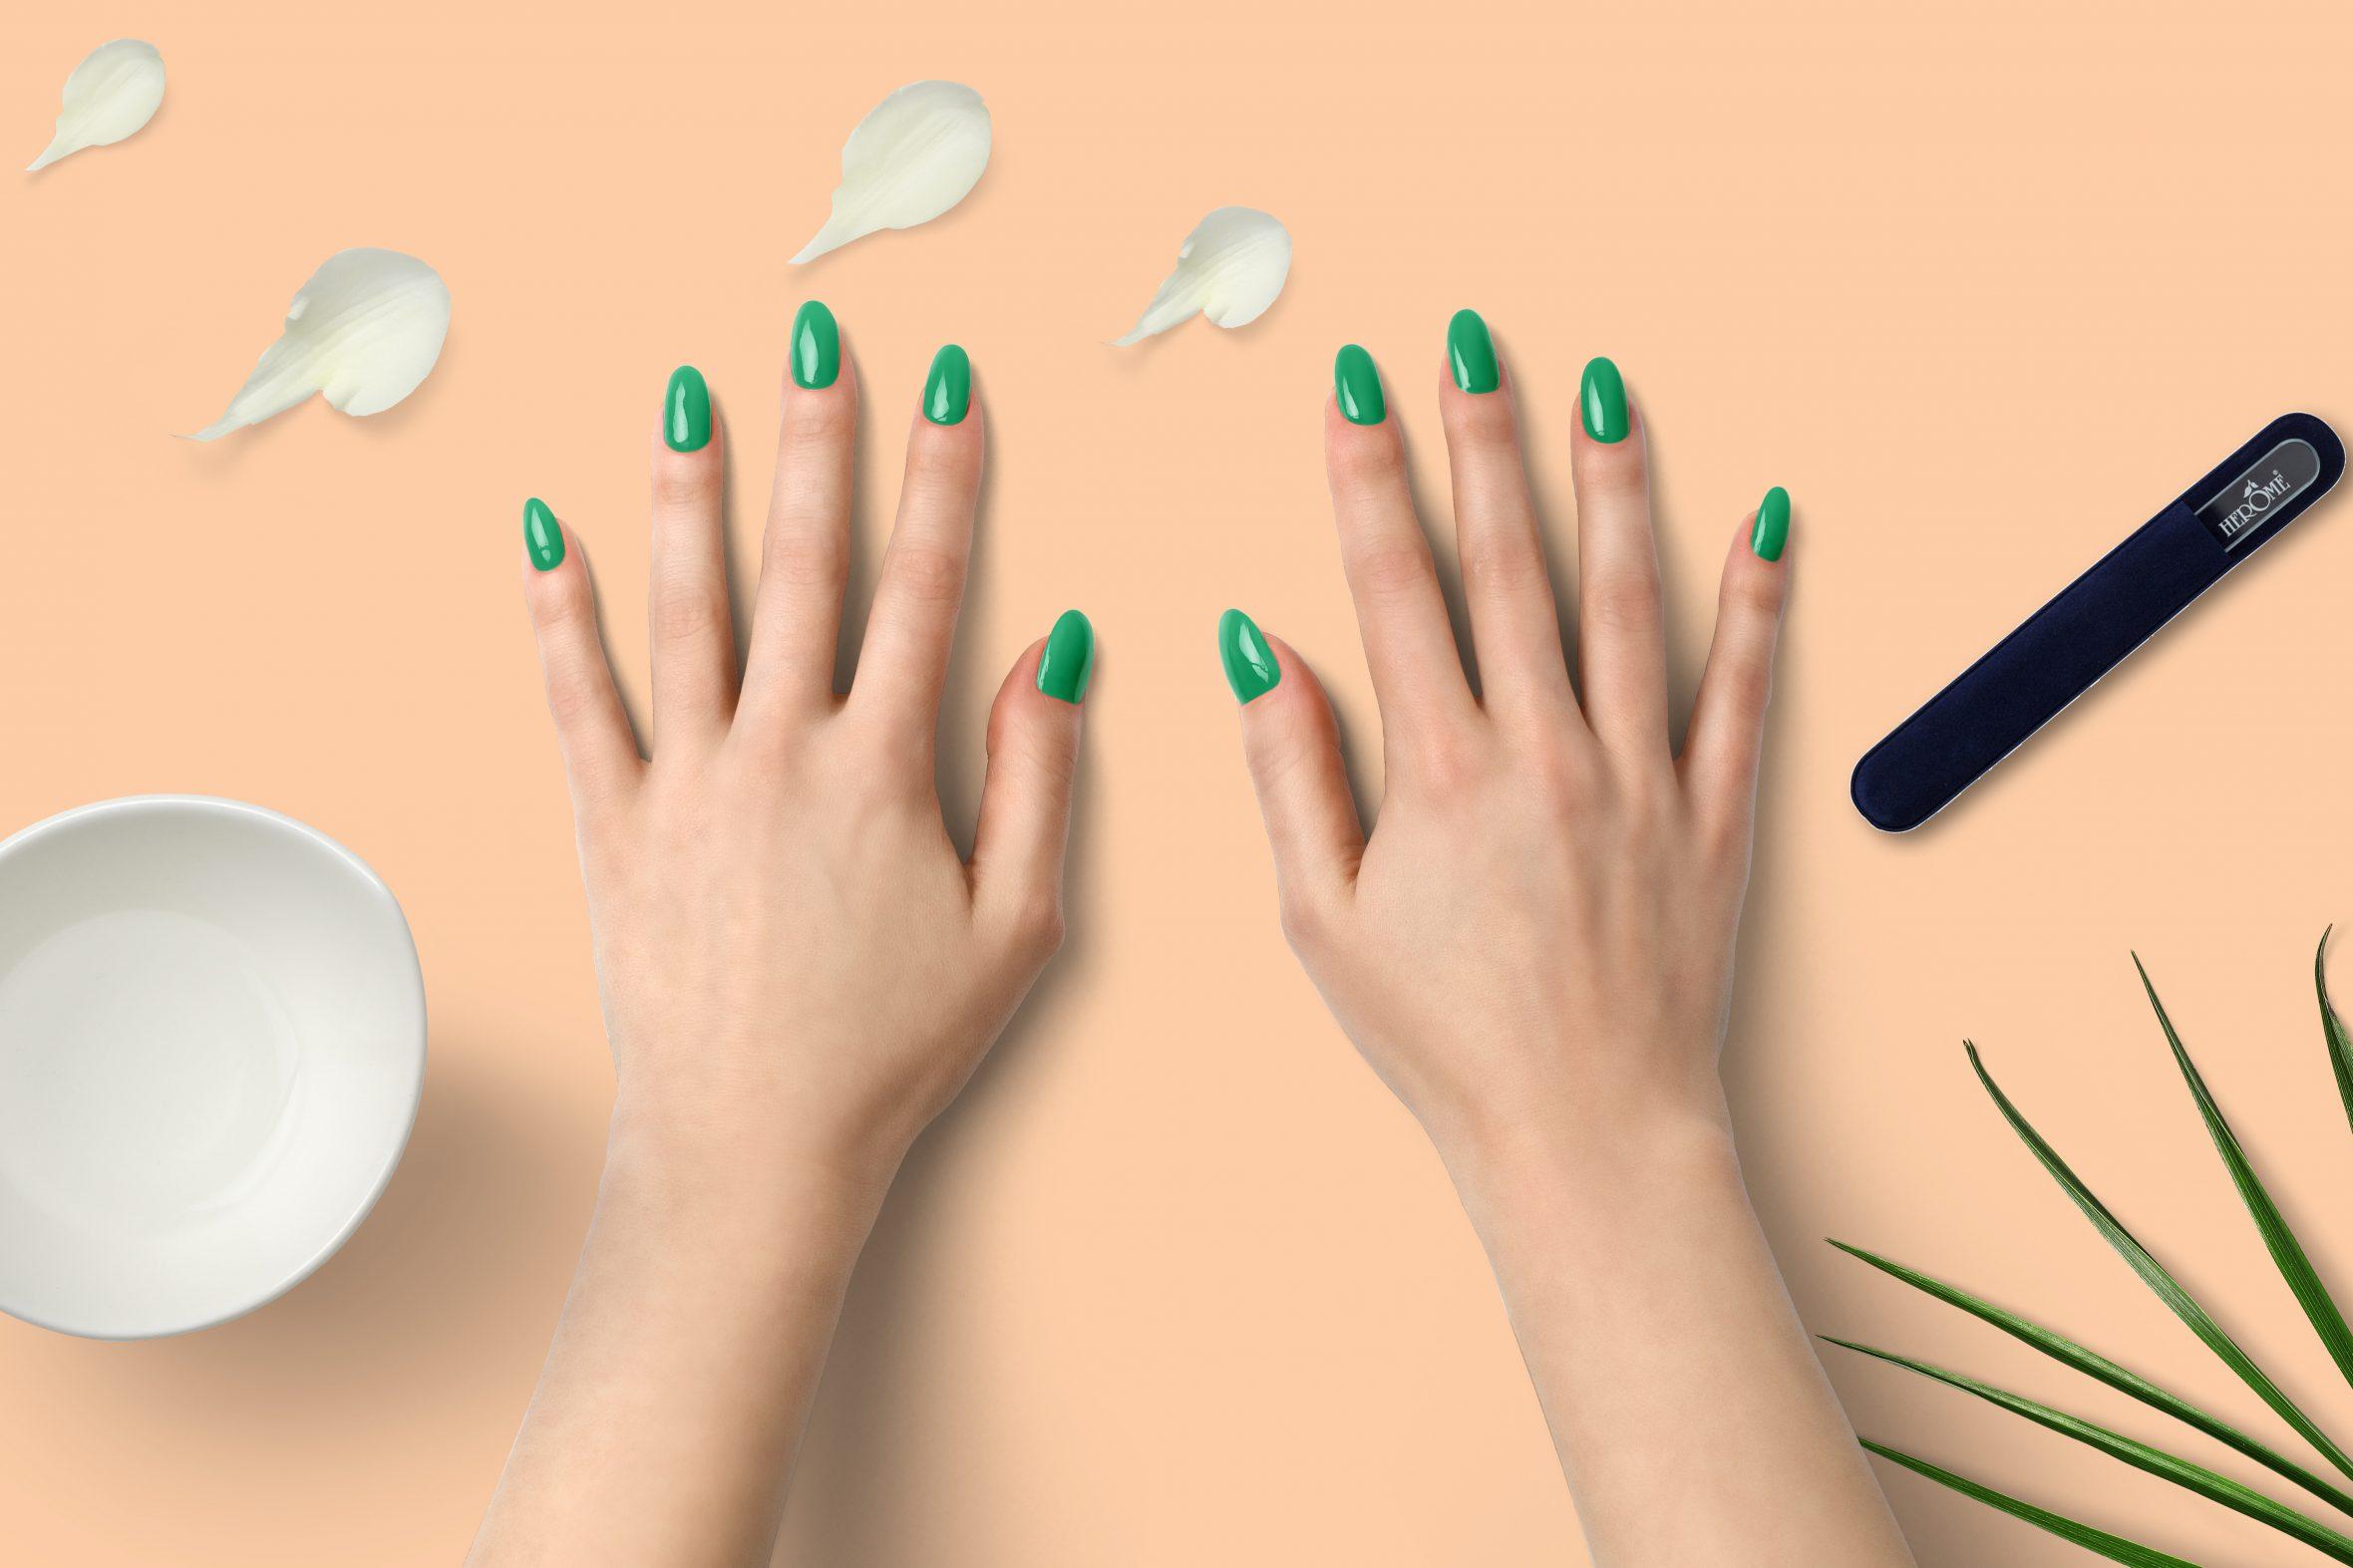 groene nagellak nummer 173 van de Herôme nagellak kleuren